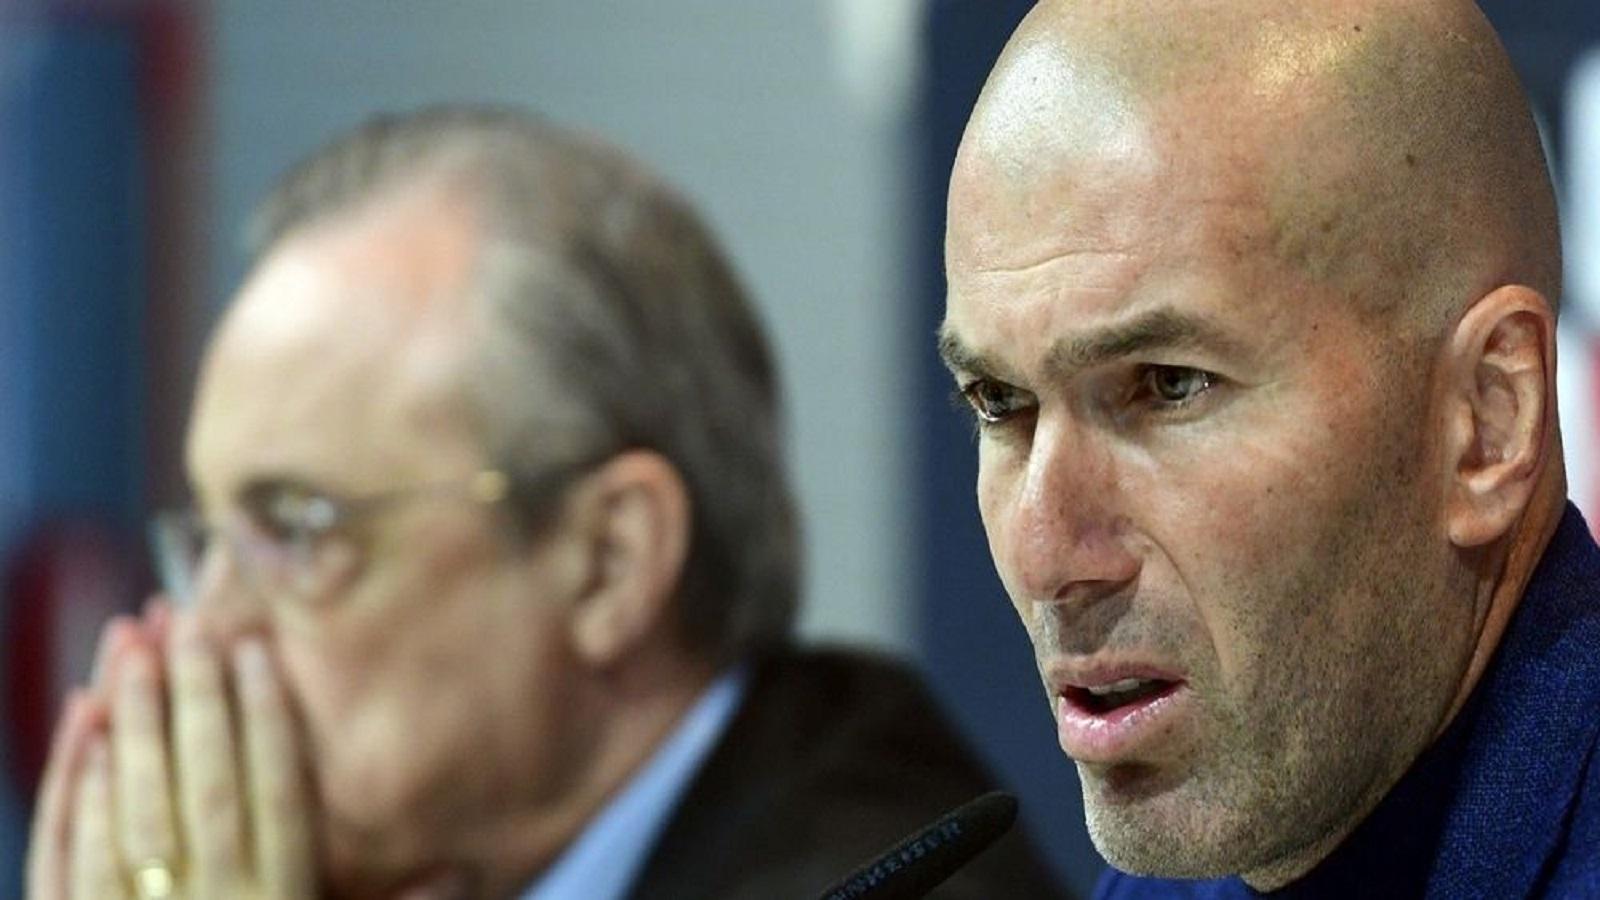 VIDEO: The Sun revela presunta pelea entre Zidane y Florentino Pérez